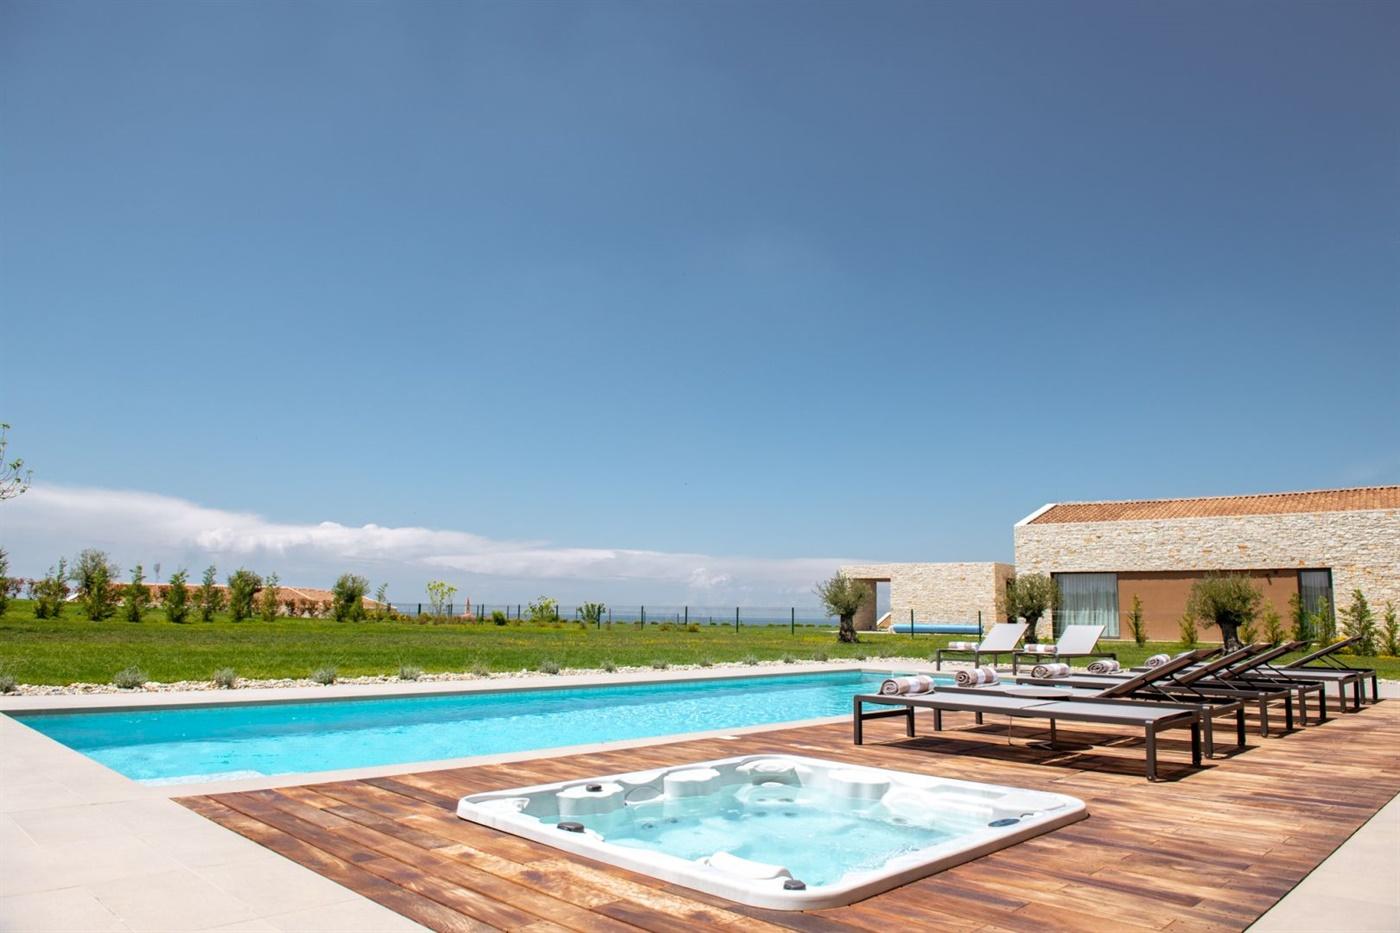 Villa San Padeo pool